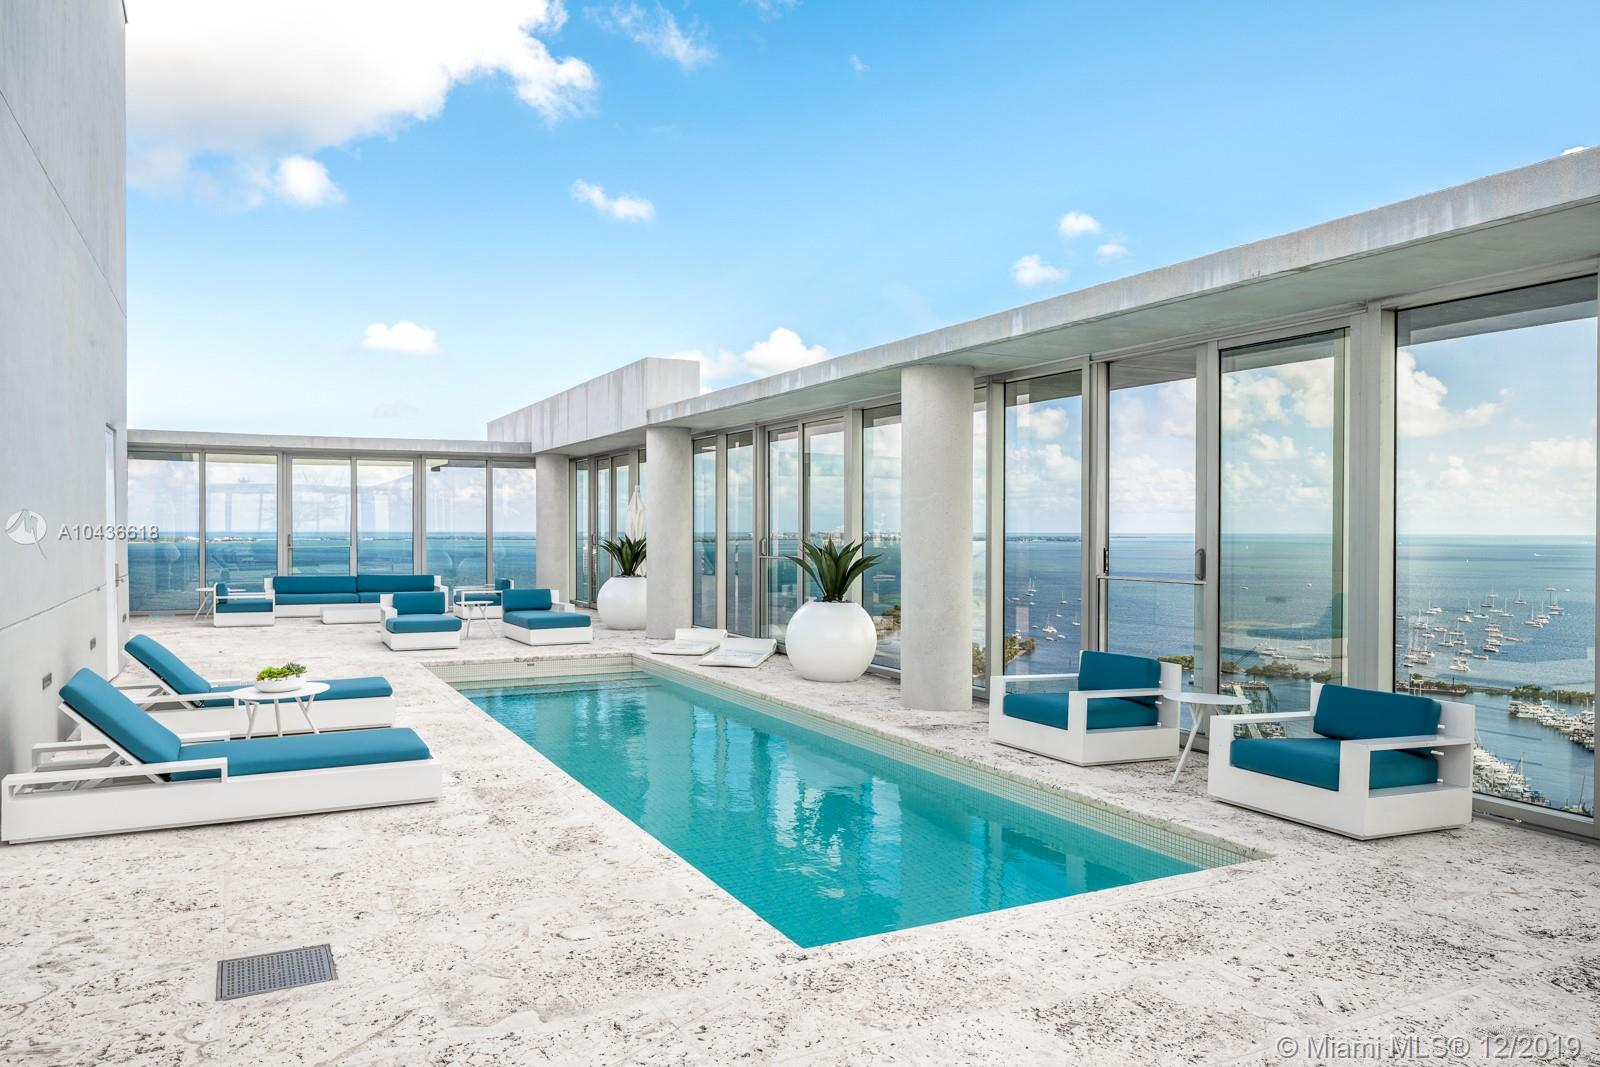 2675 S Bayshore Drive, Unit #PH-1 Luxury Real Estate